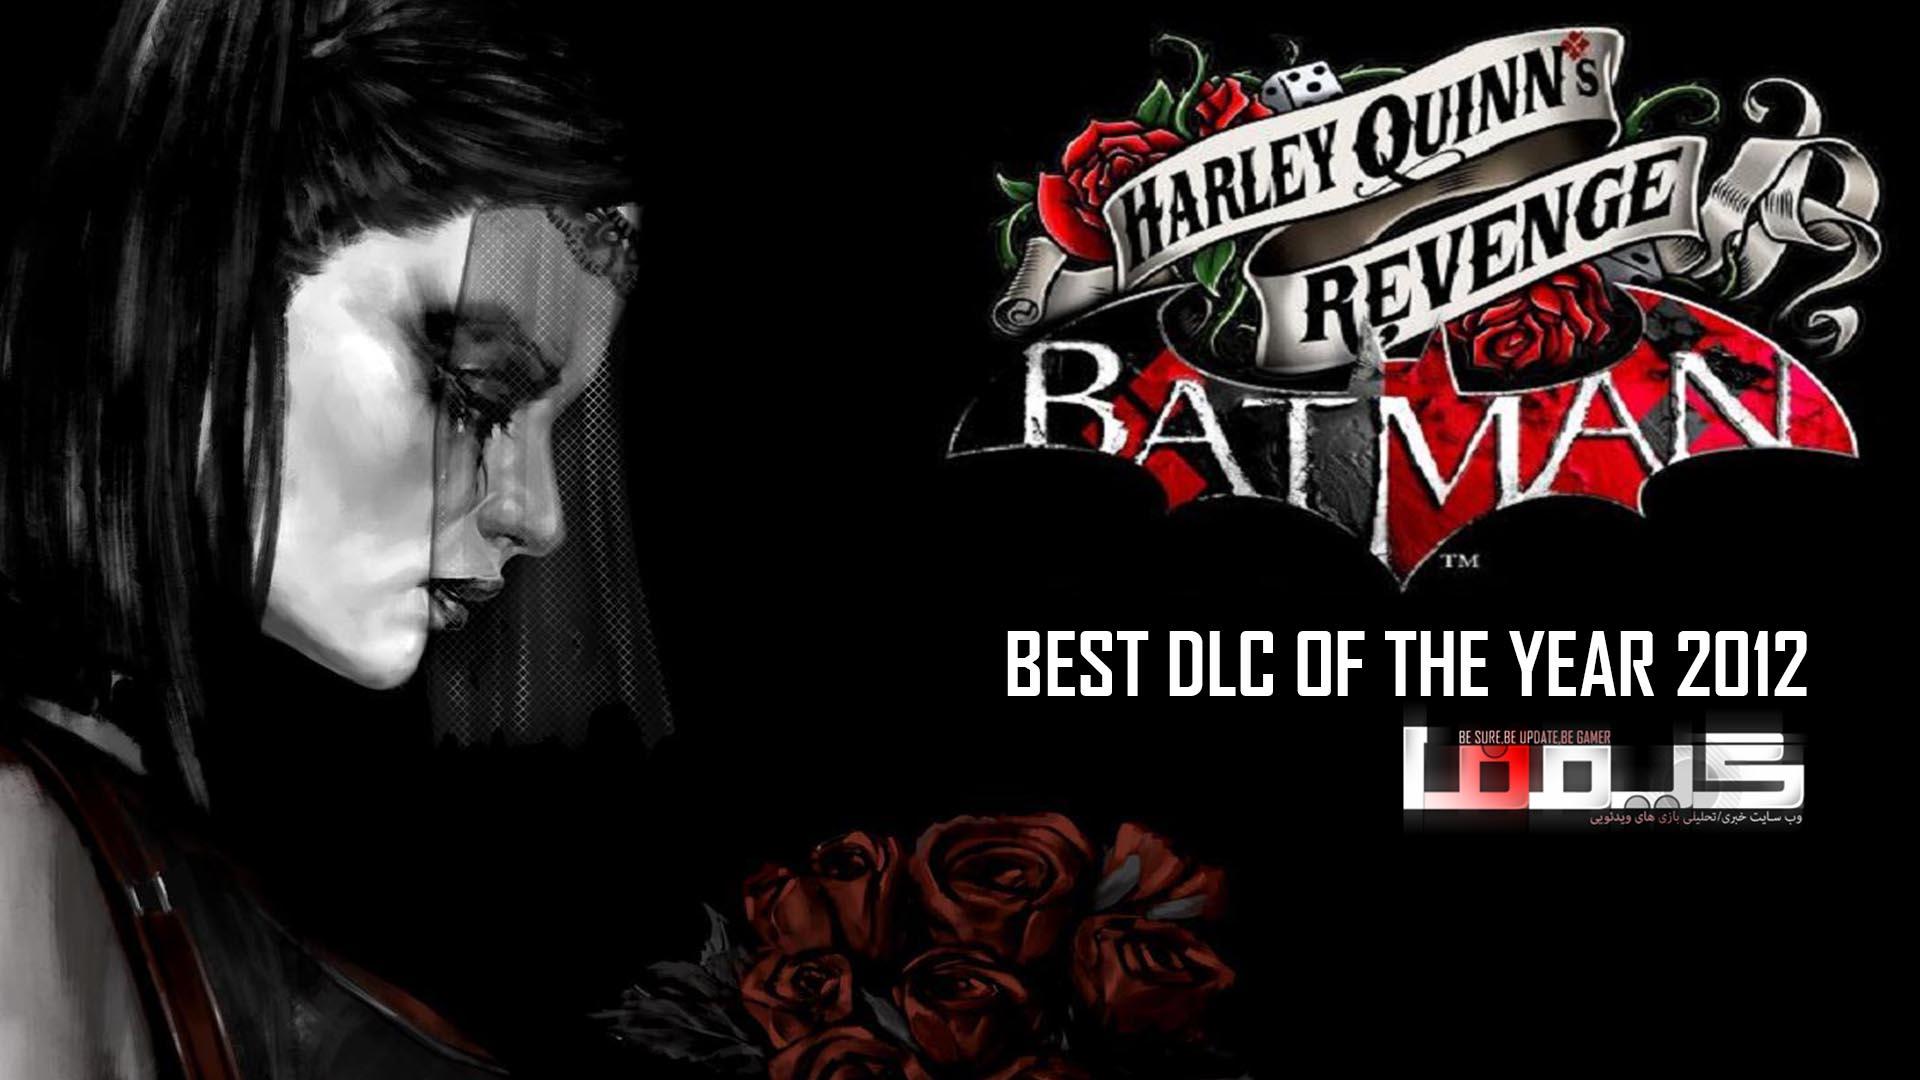 Best dlc of the year 2012 Batman Arkham City : Harley Quinn's Revenge،برترین DLC سال به انتخاب شما